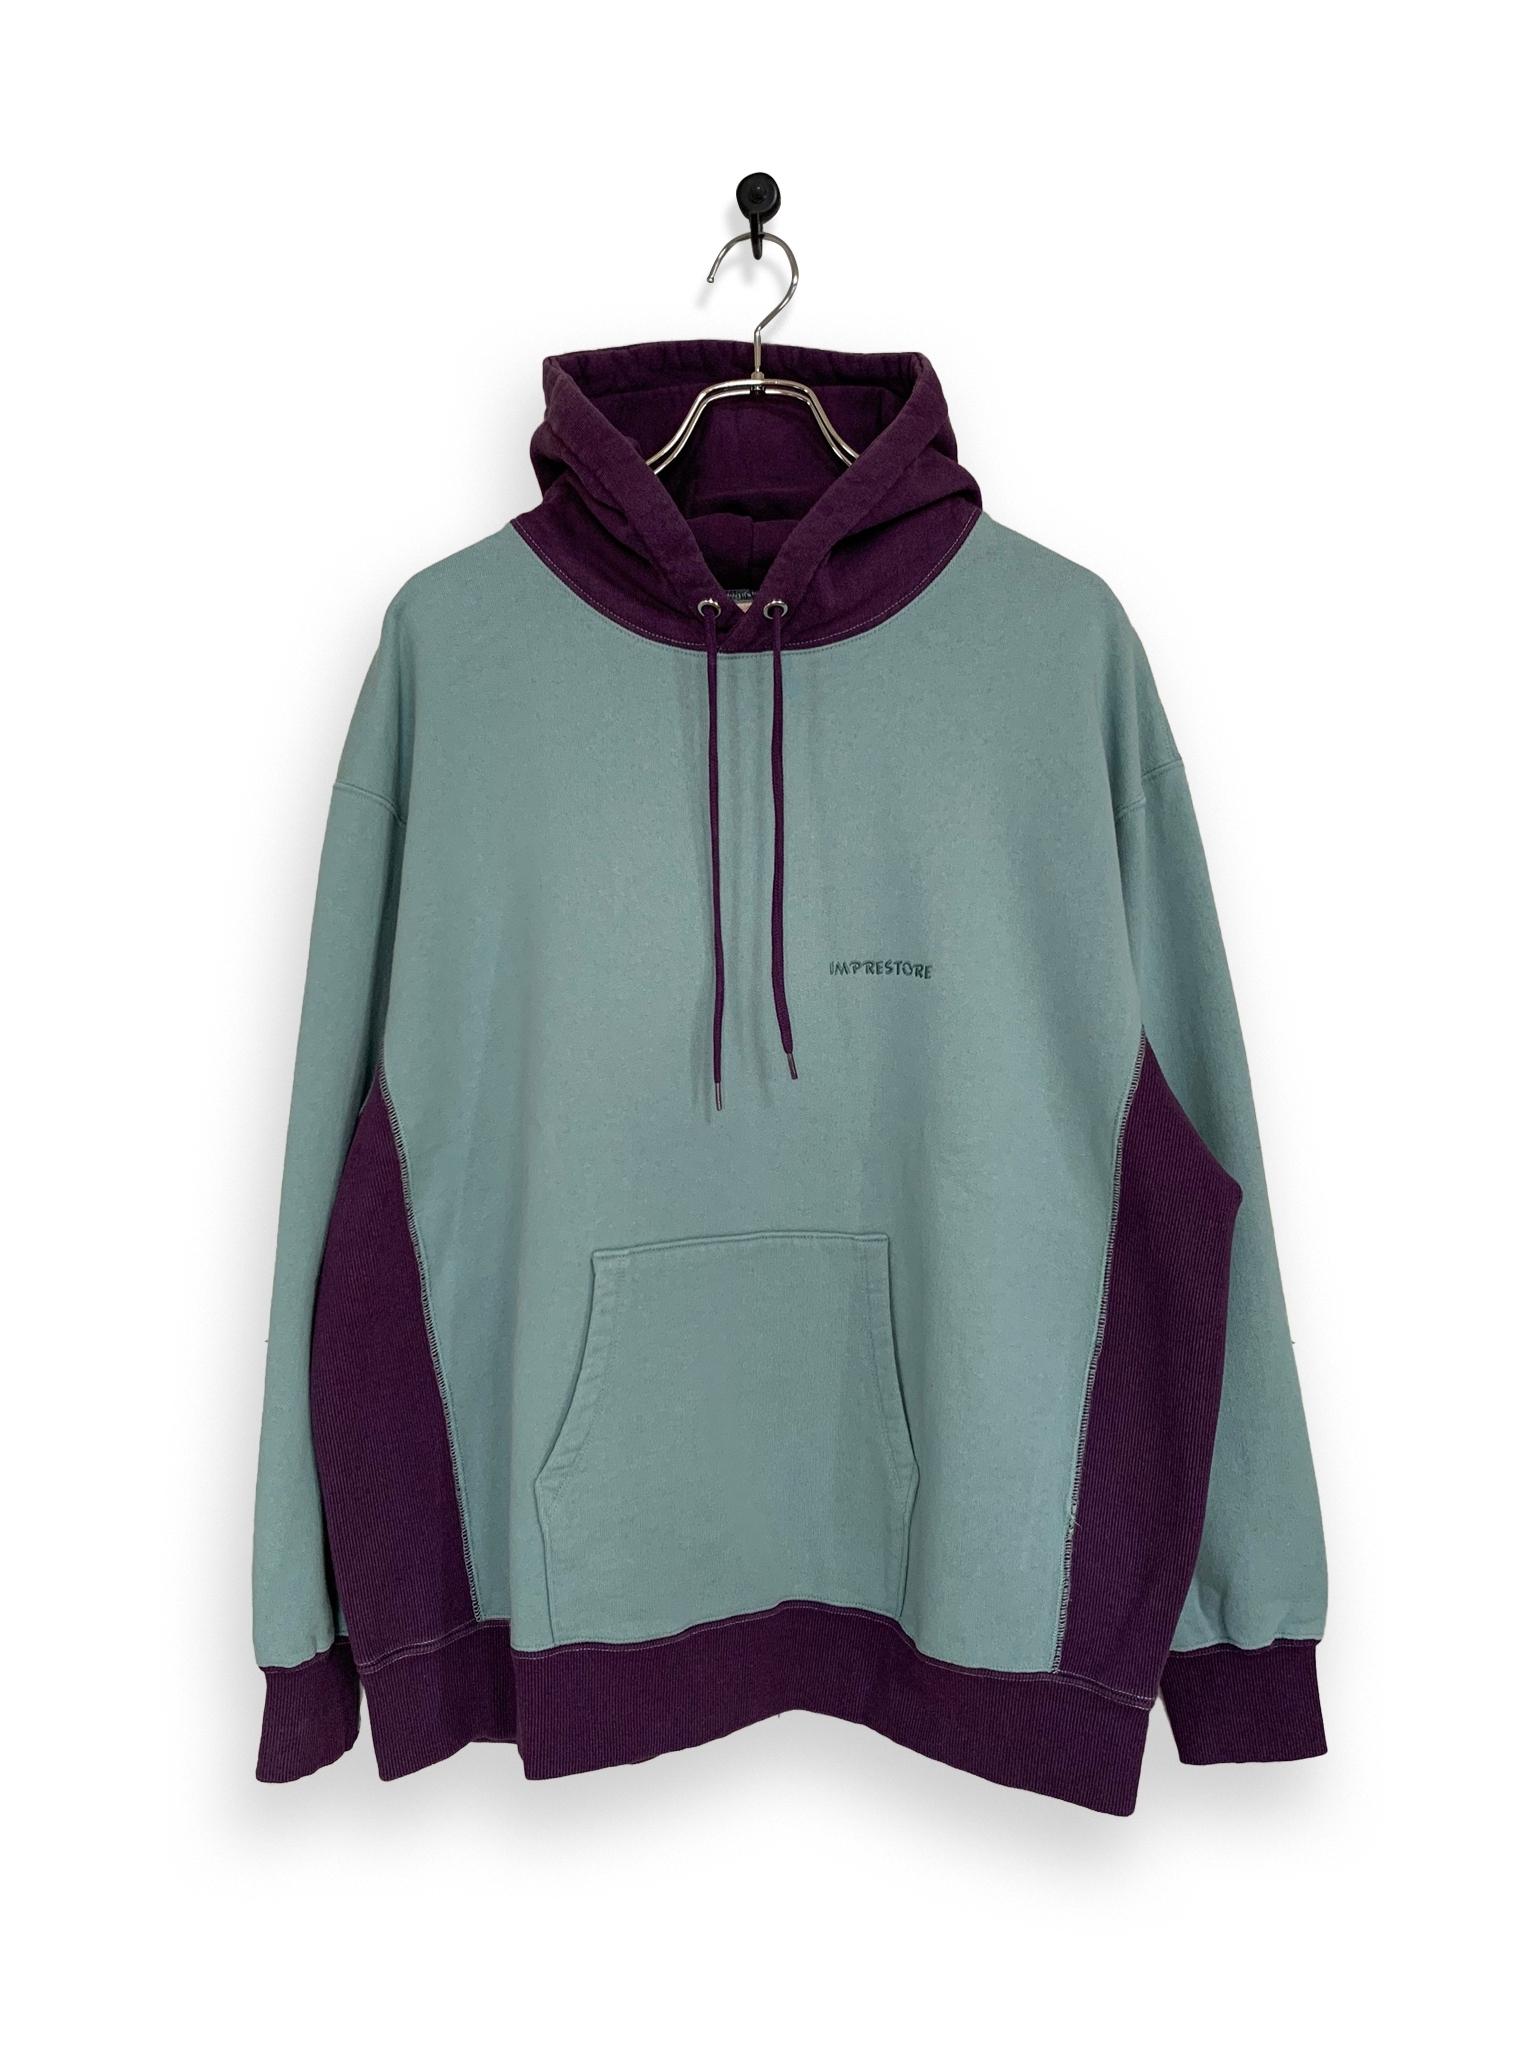 Original Hooded Sweatshirt / 2tone / sax blue × purple